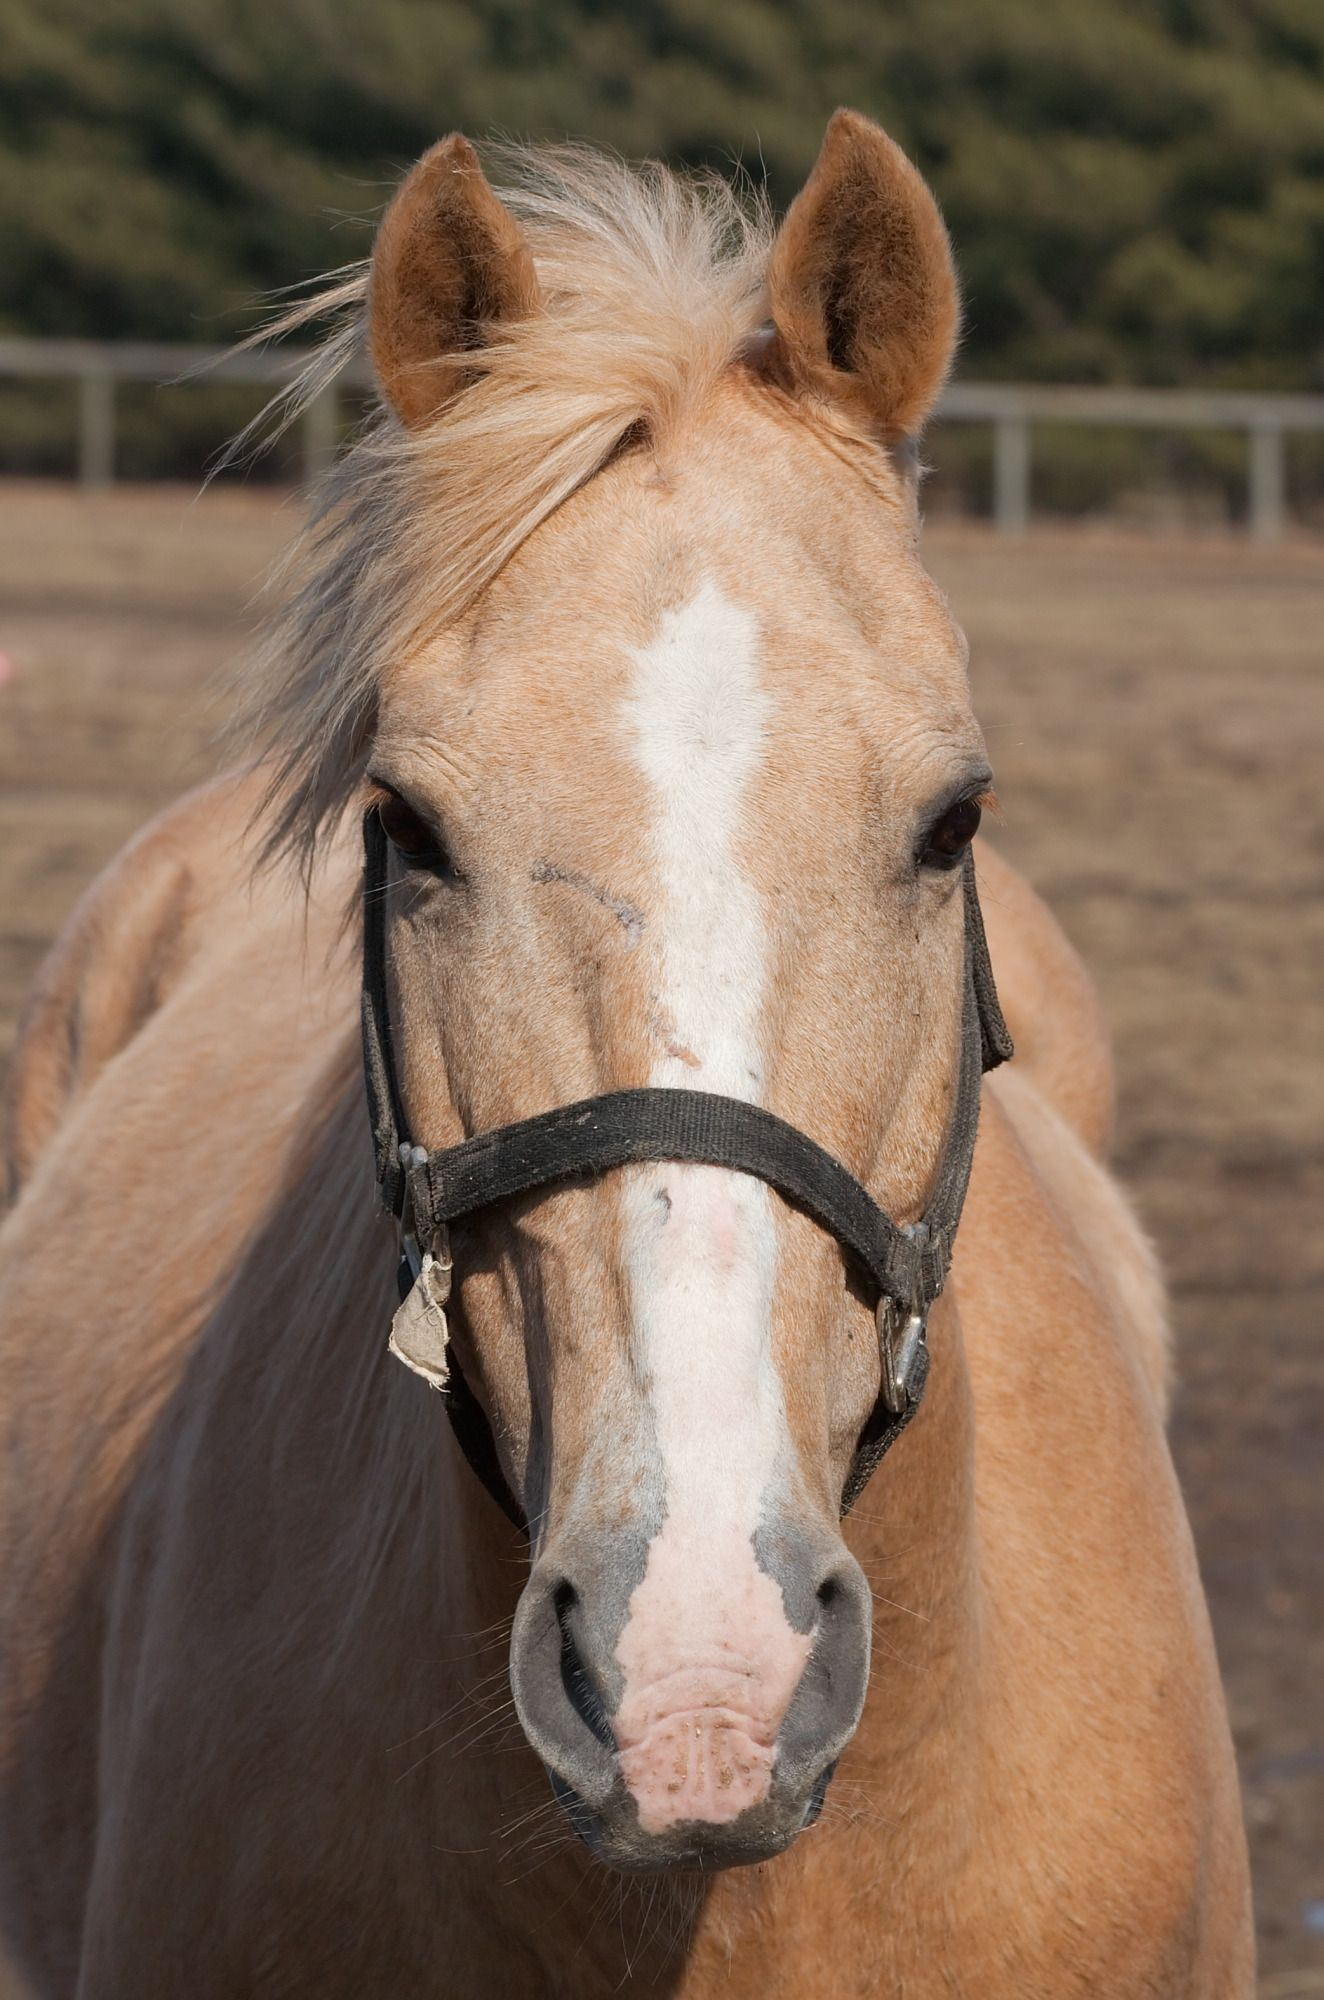 horse face - Google Search | HORSES I'D LOVE ...